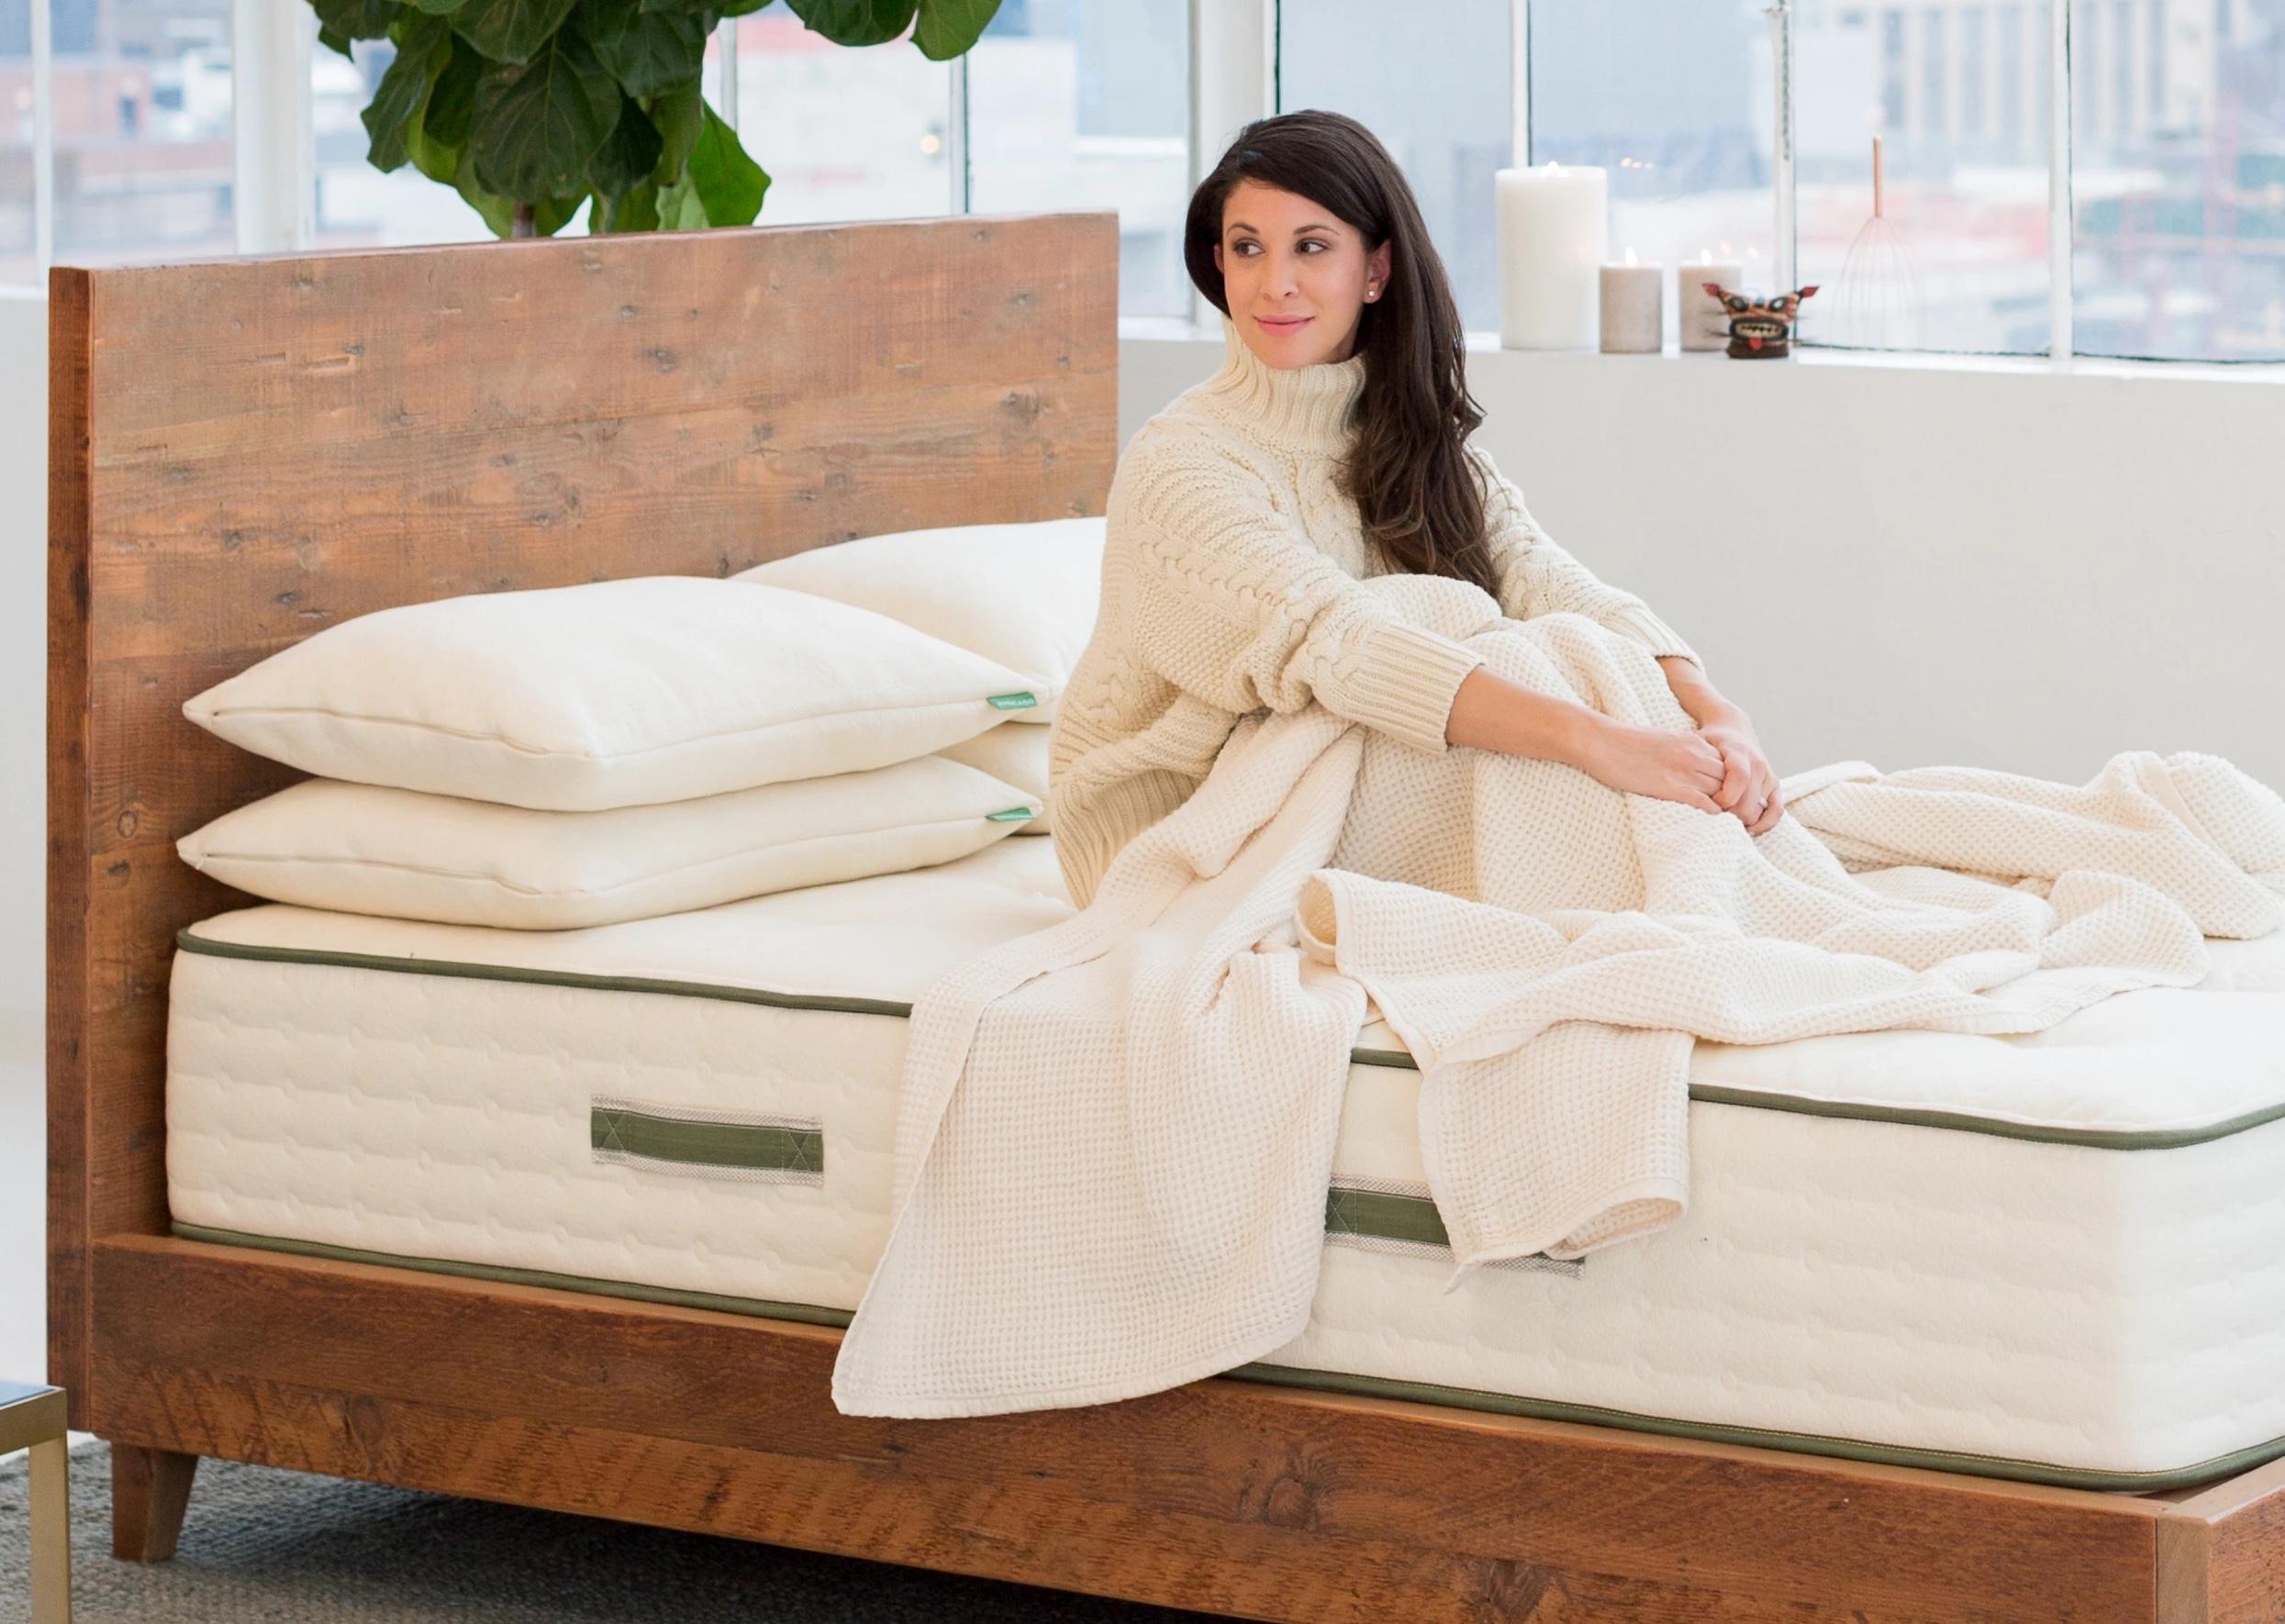 Avocado mattress for back pain